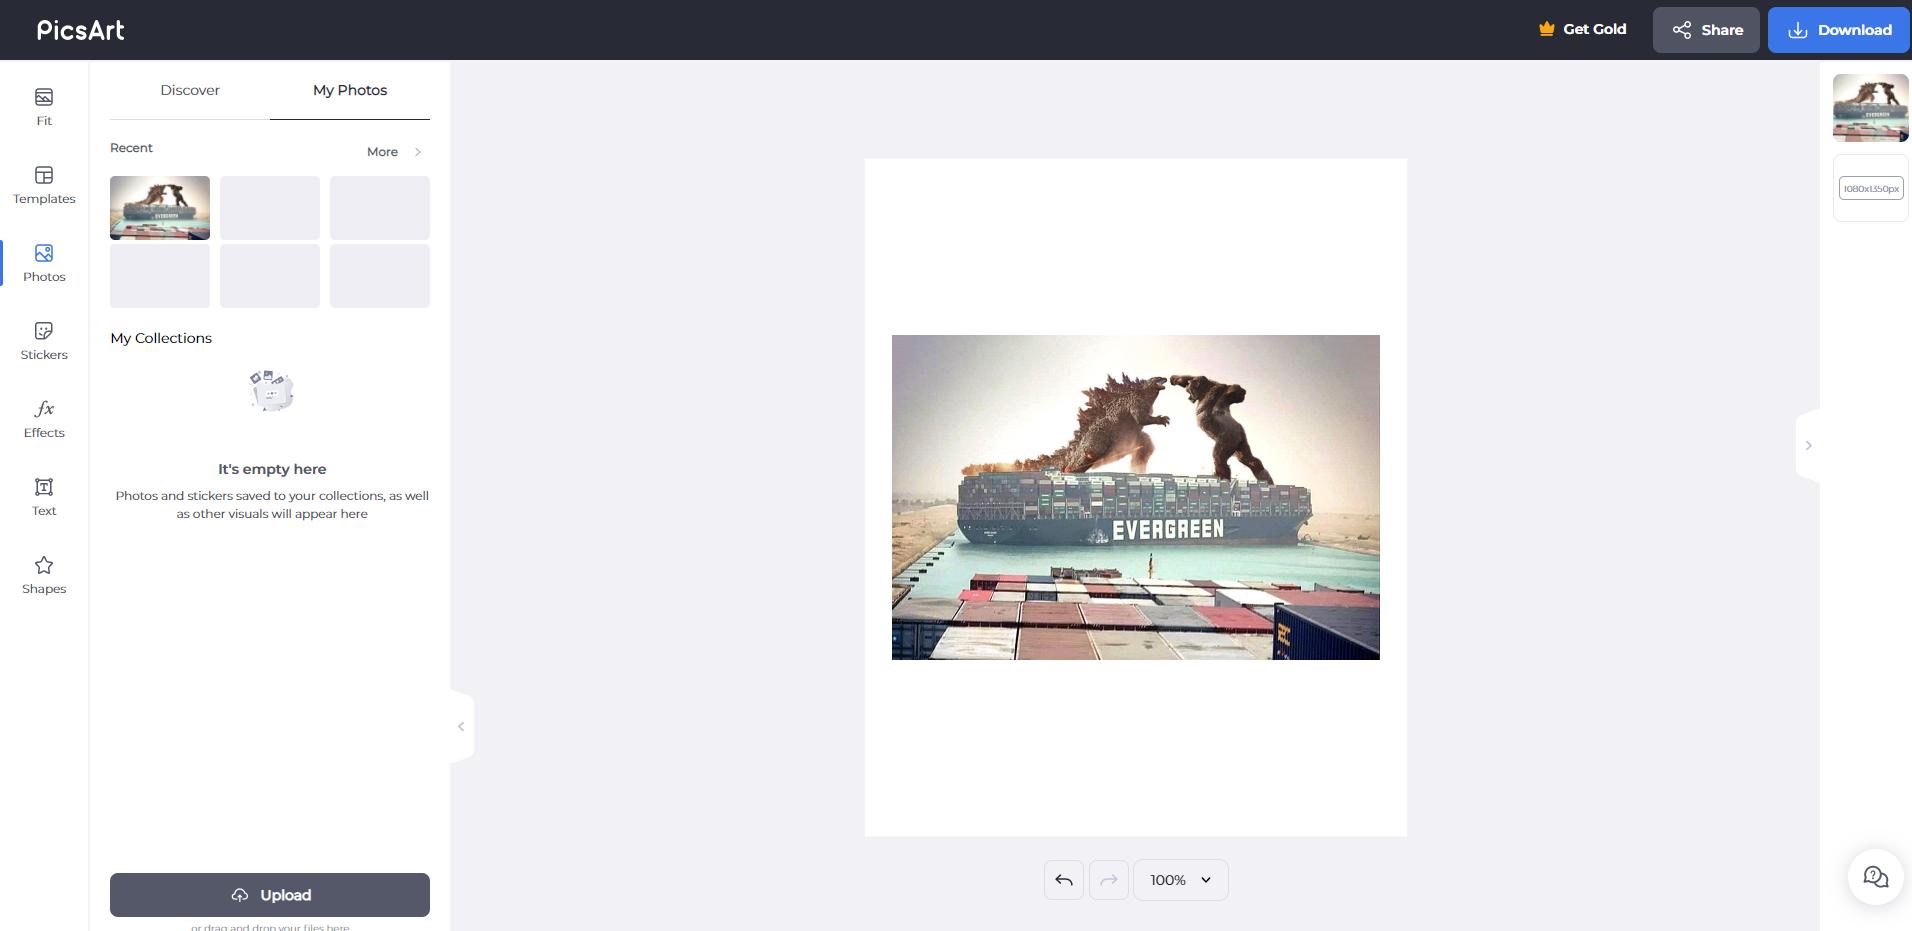 https://cloud-movzo1gko-hack-club-bot.vercel.app/0image.png